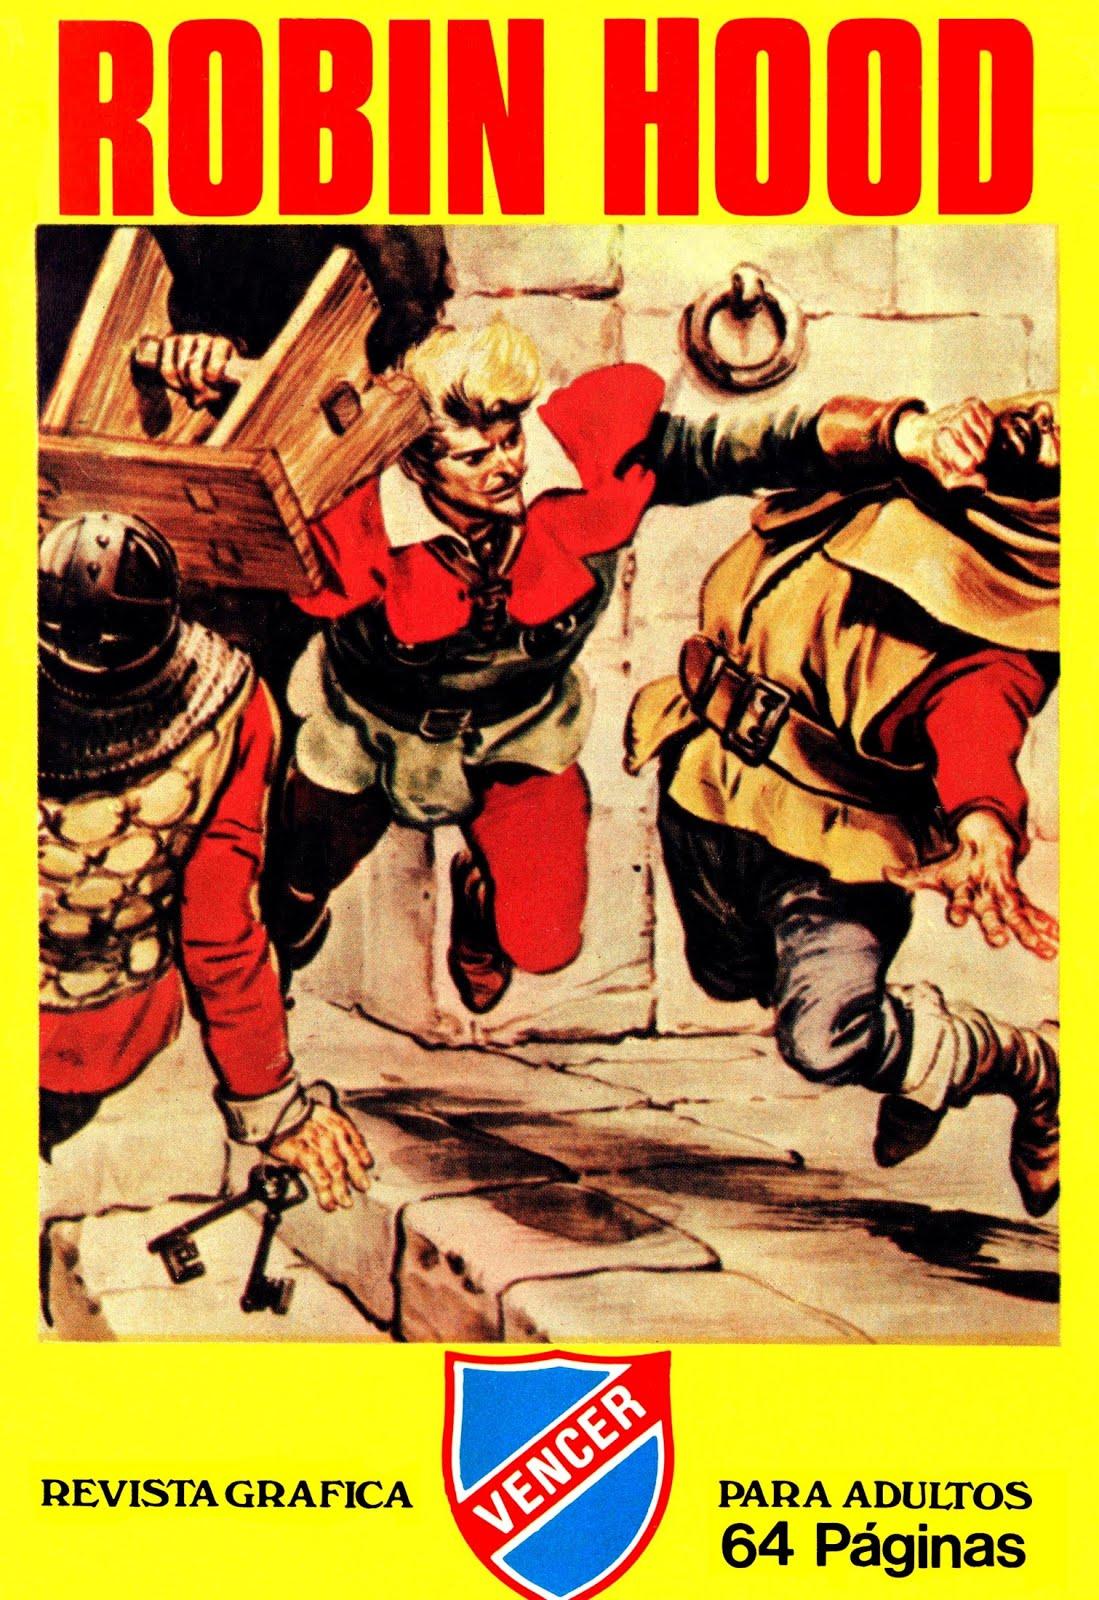 Robin Hood. Colección completa, 8 tebeos